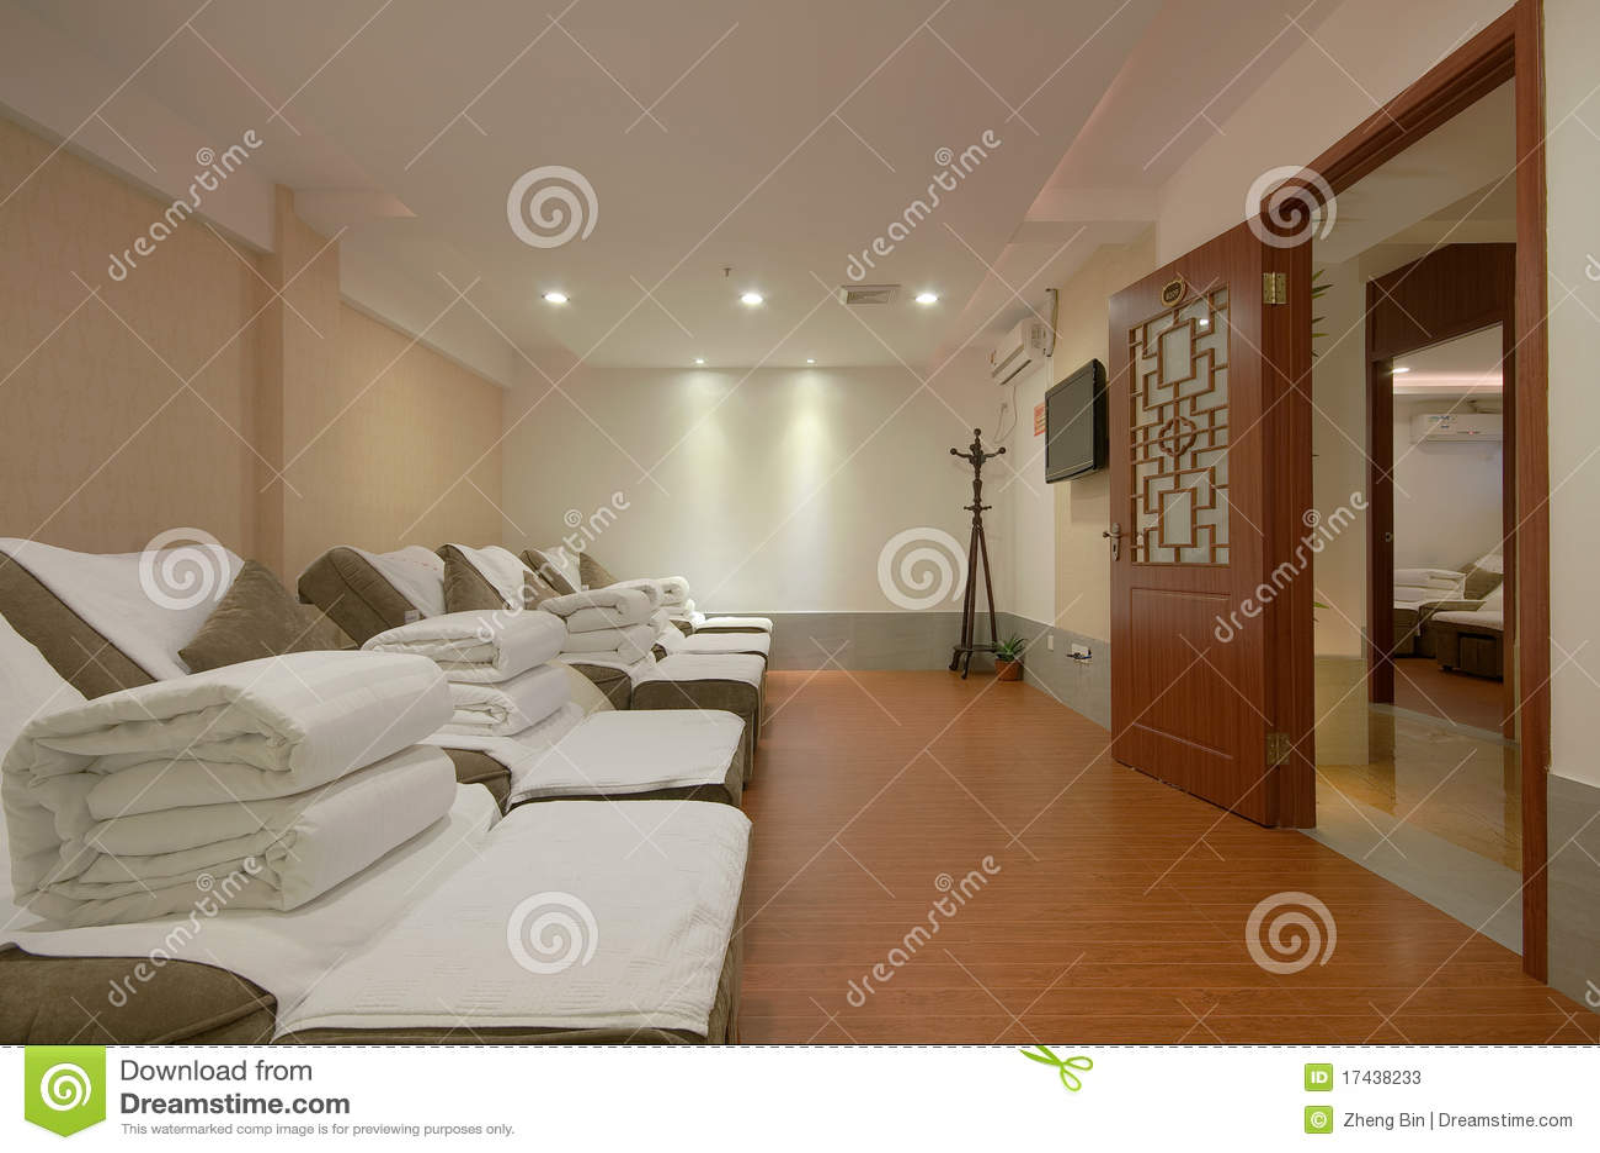 Massage parlors